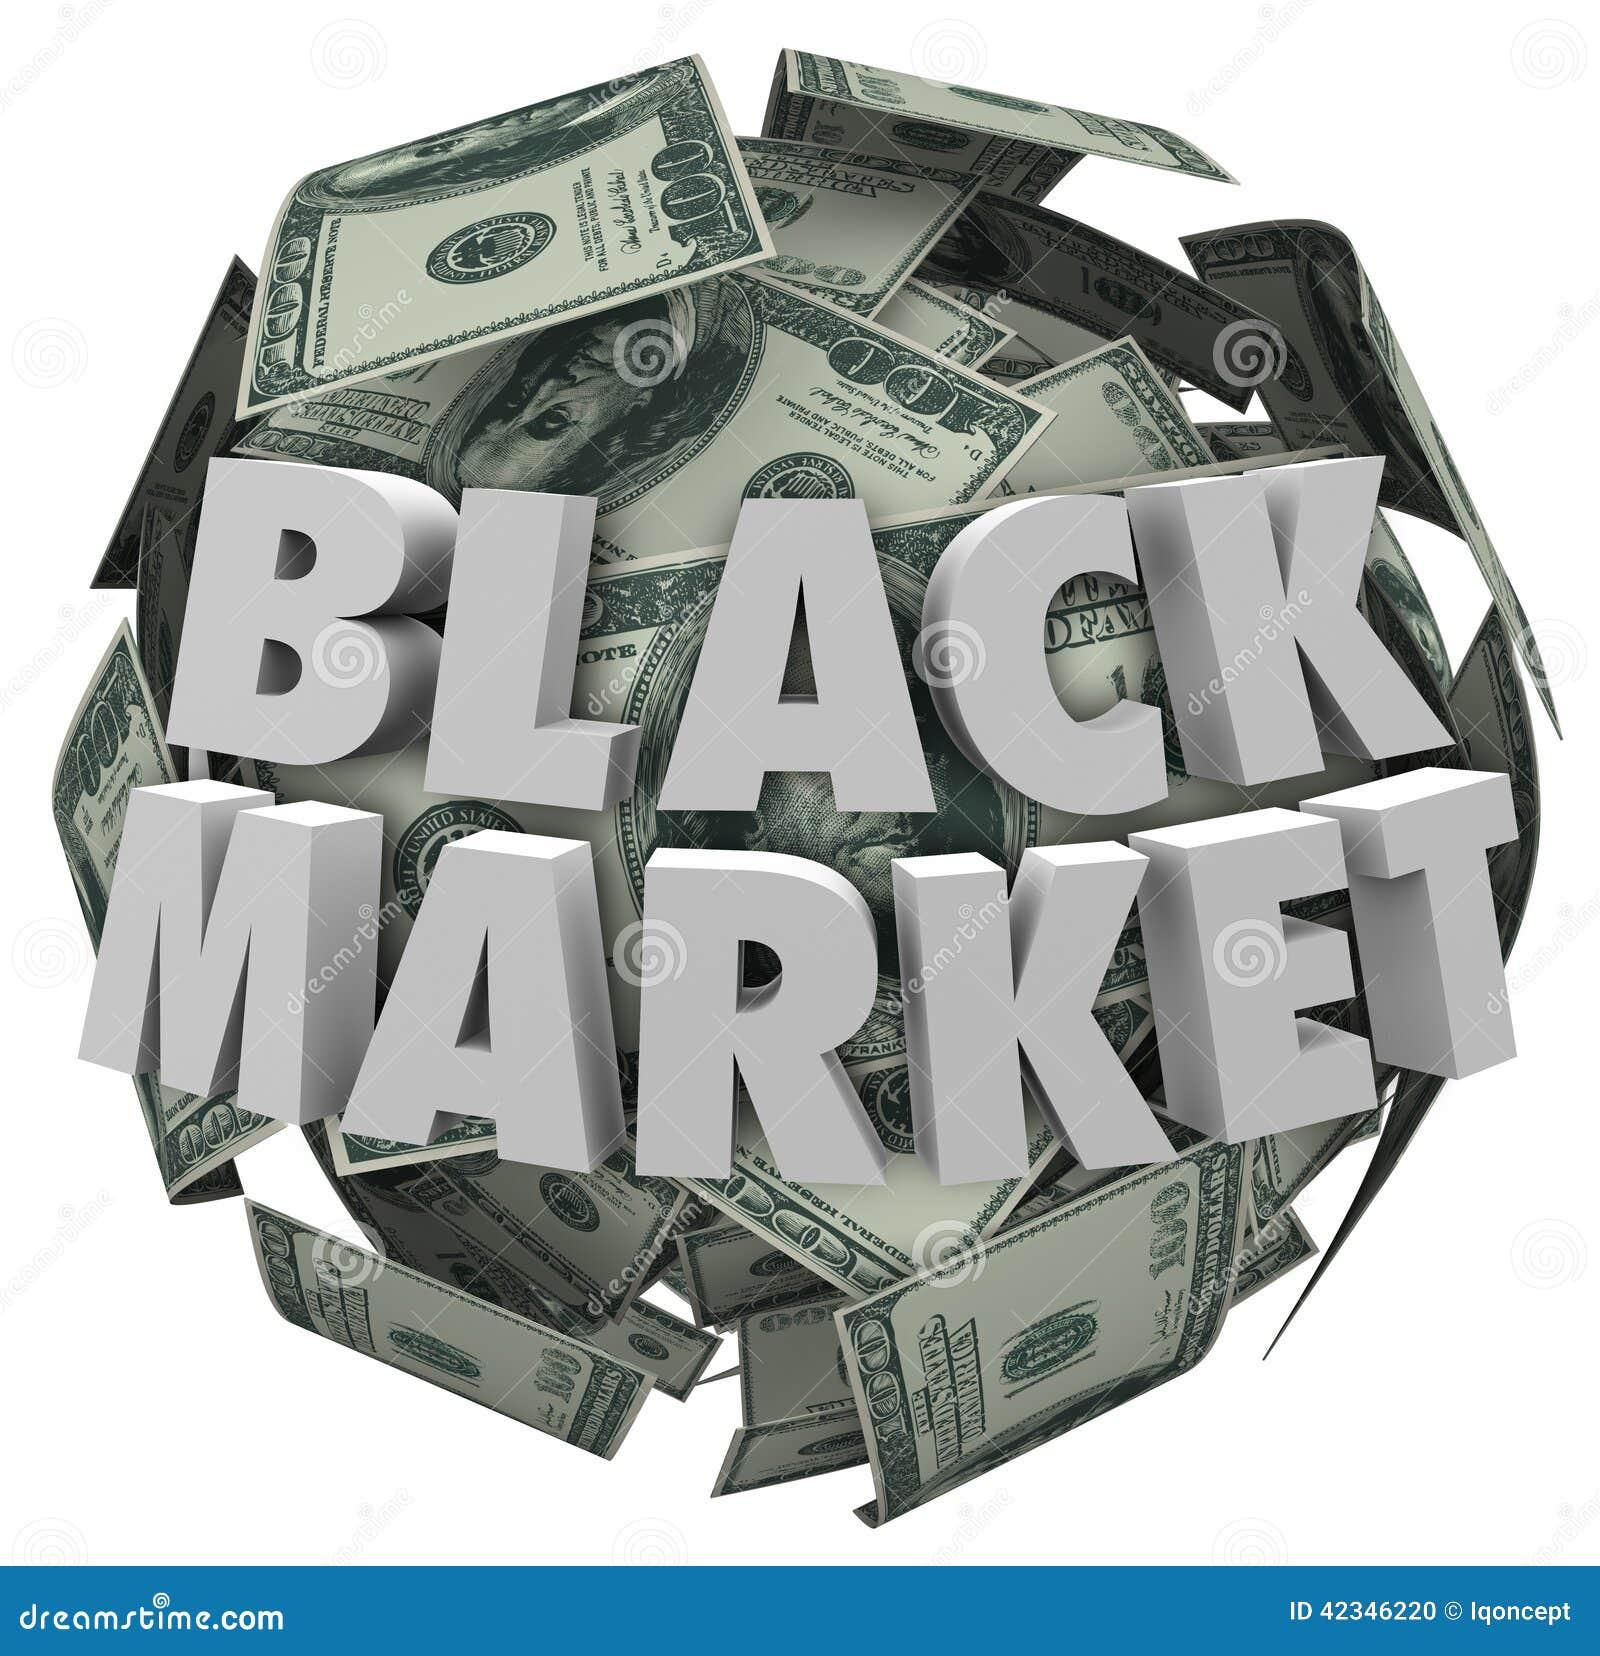 Black Market Money Ball Unreported Illegal Transactions